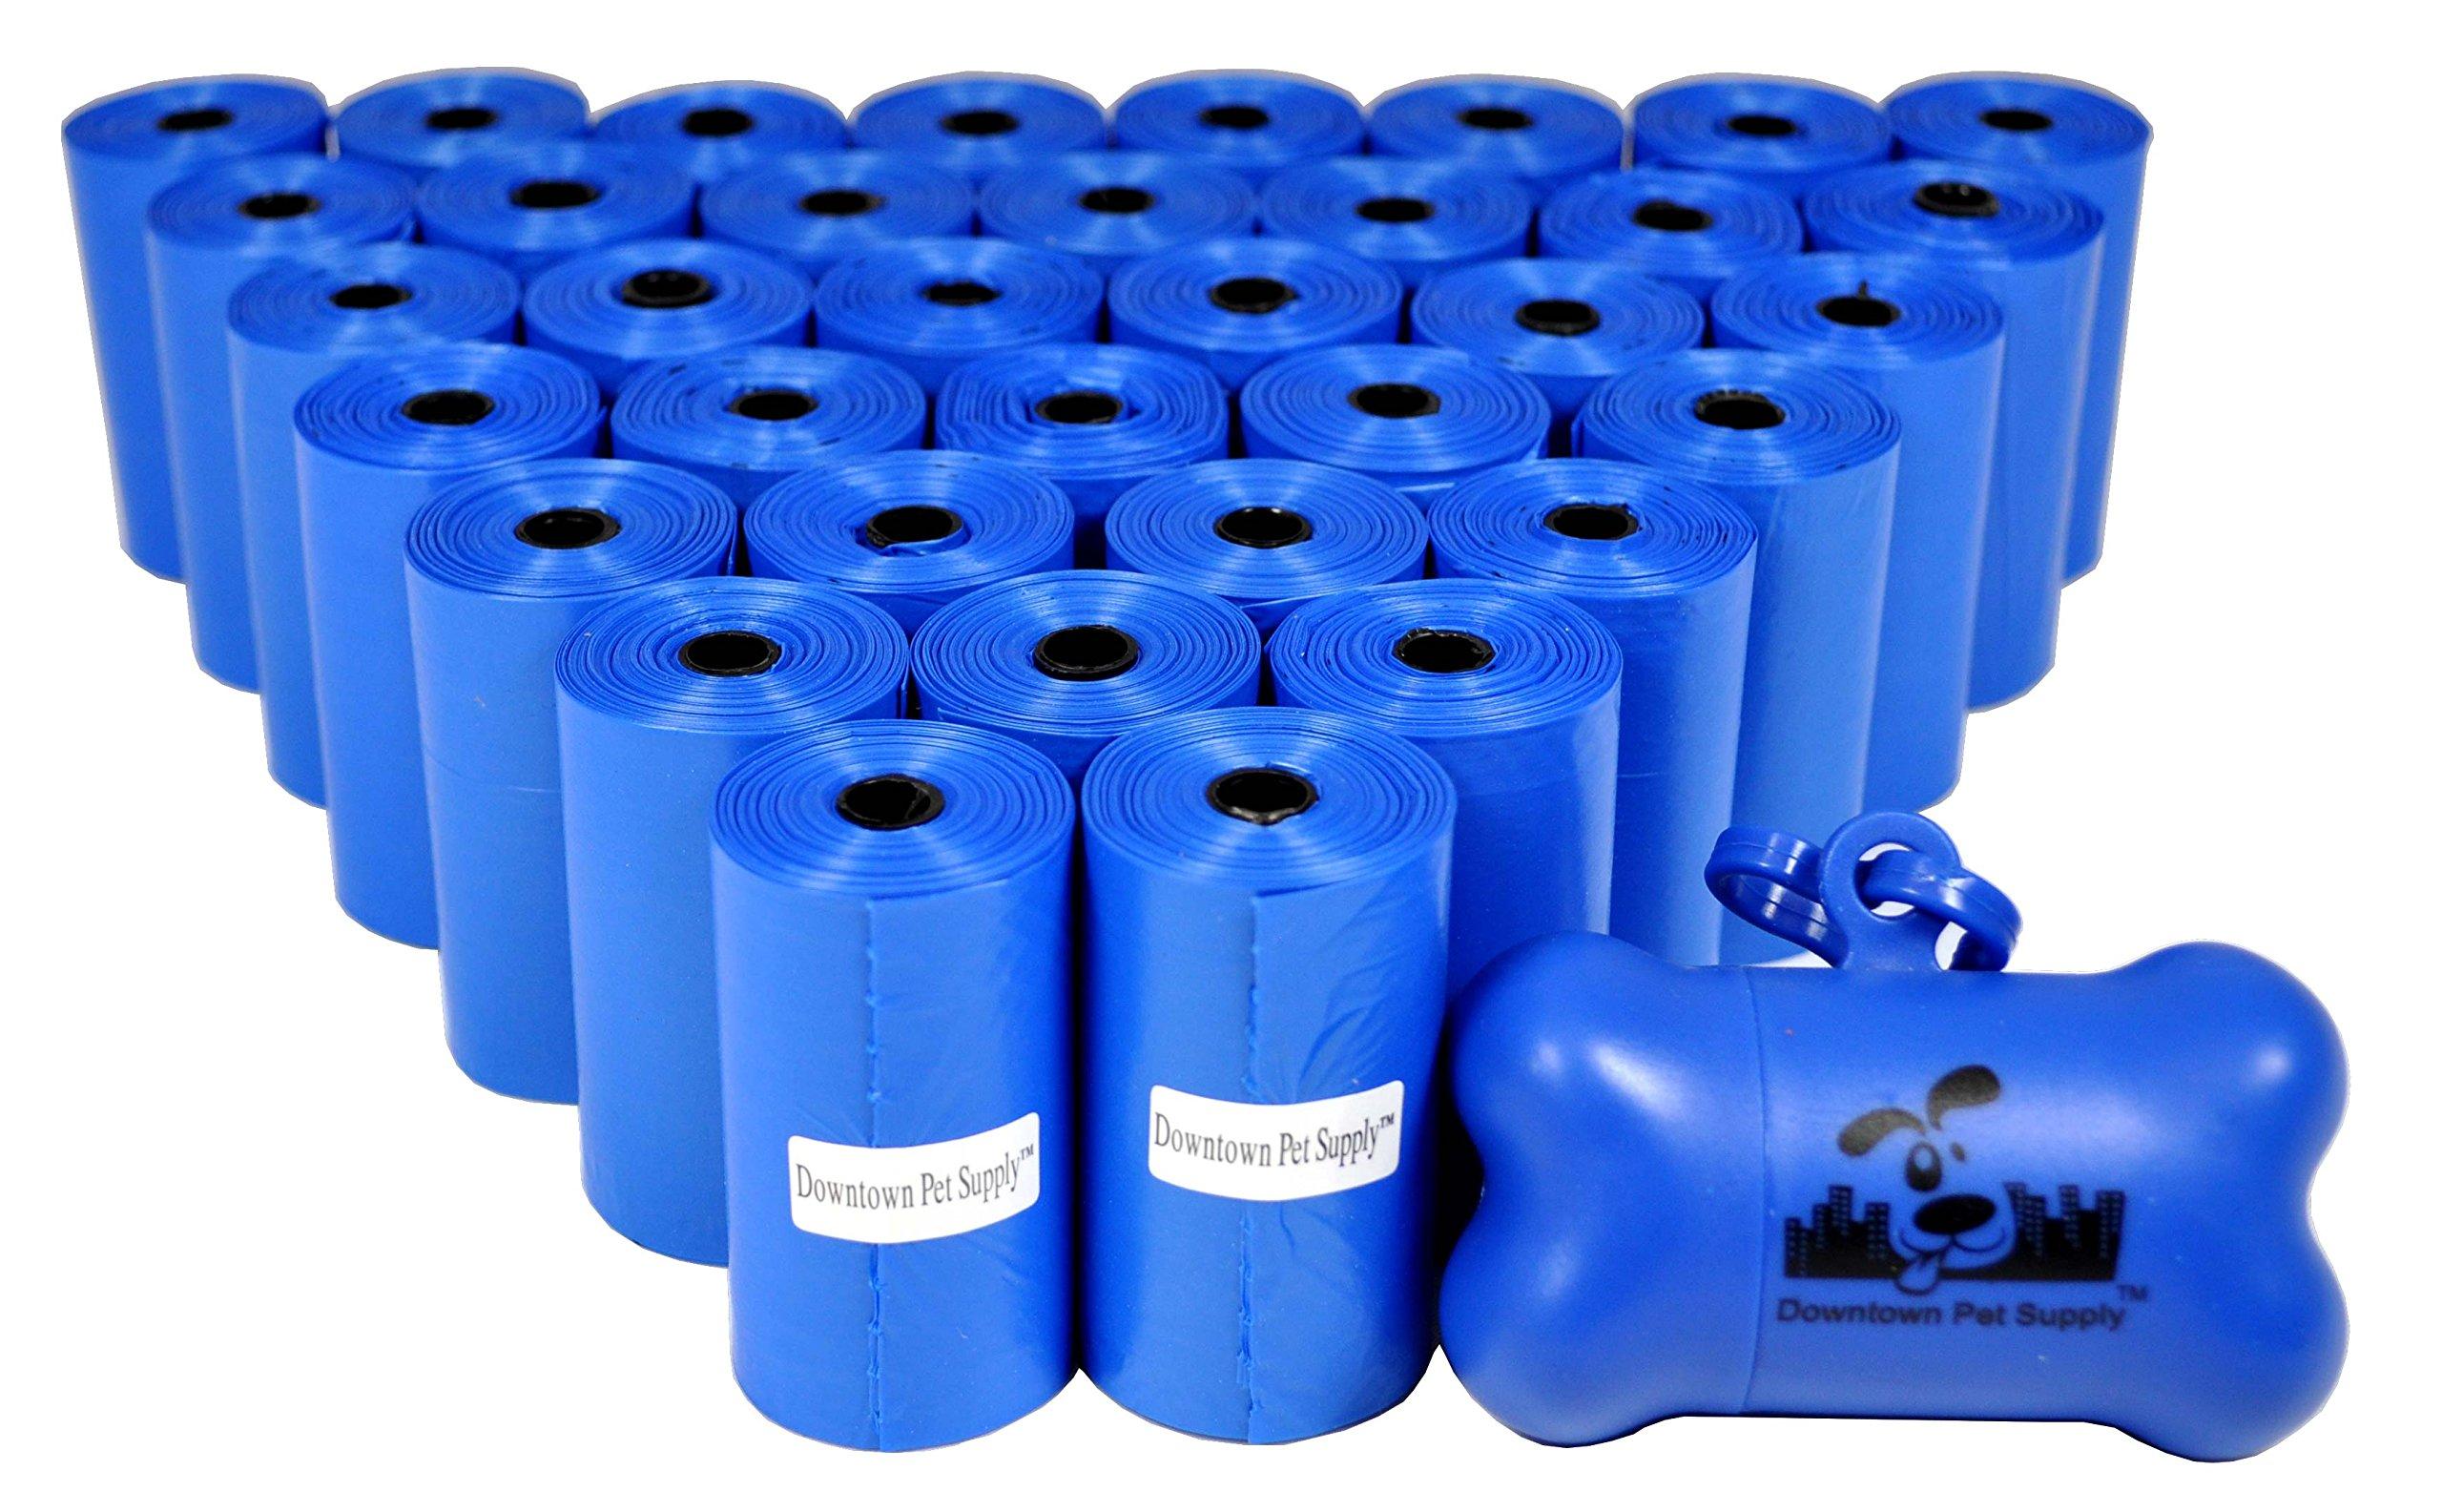 Downtown Pet Supply 700 Pet Waste Bags, Dog Waste Bags, Bulk Poop Bags on a roll, Clean up poop bag refills - (Color: Blue) + FREE Bone Dispenser, by